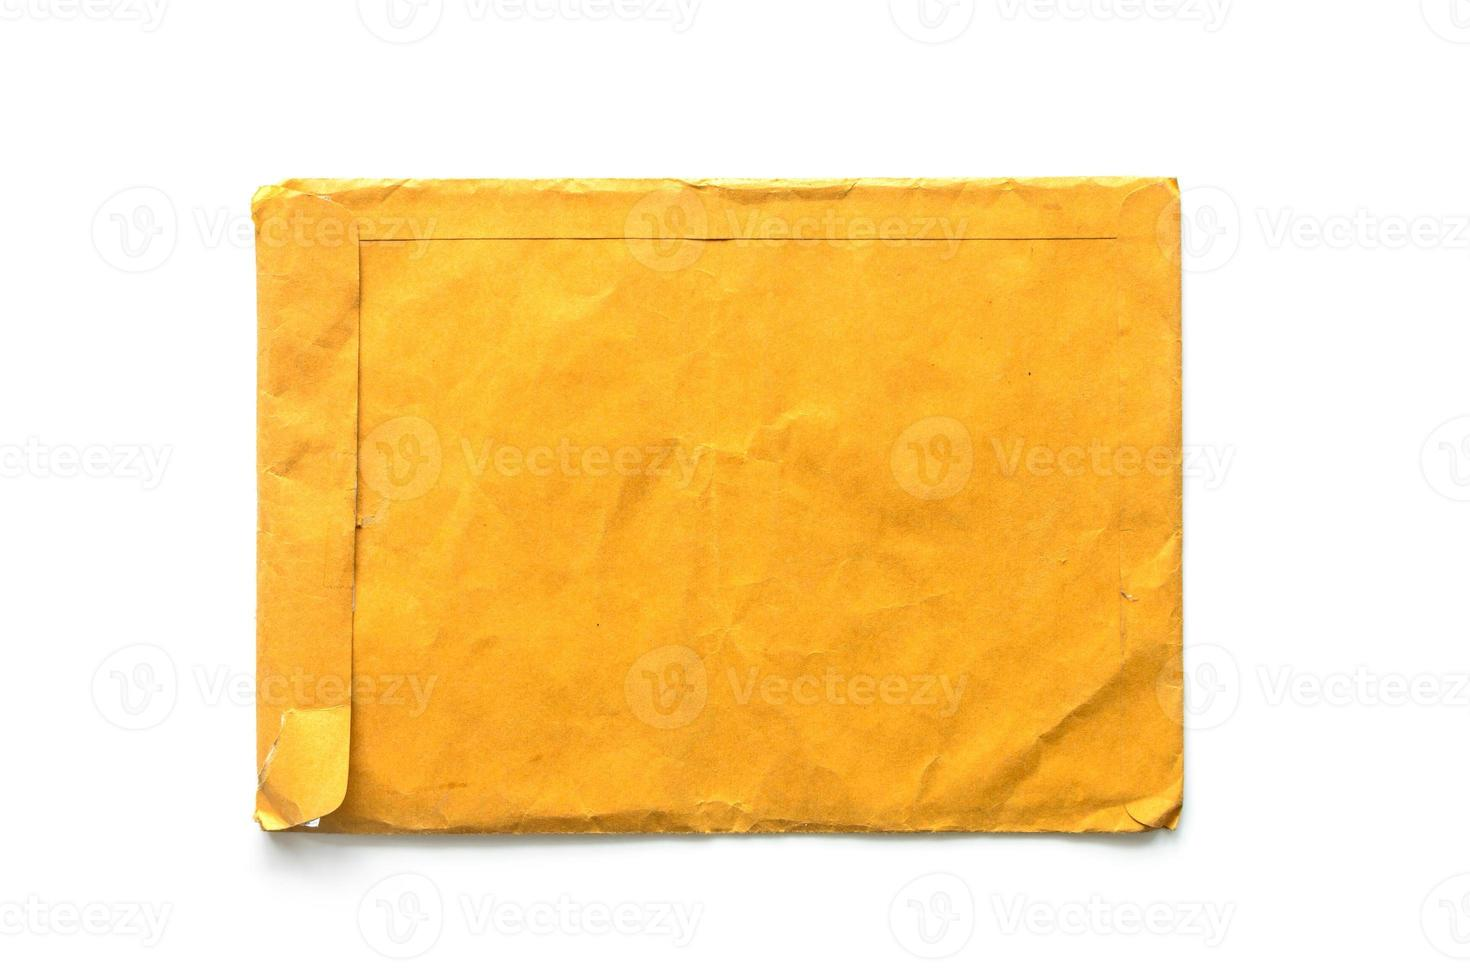 bruin envelopdocument op witte achtergrond foto